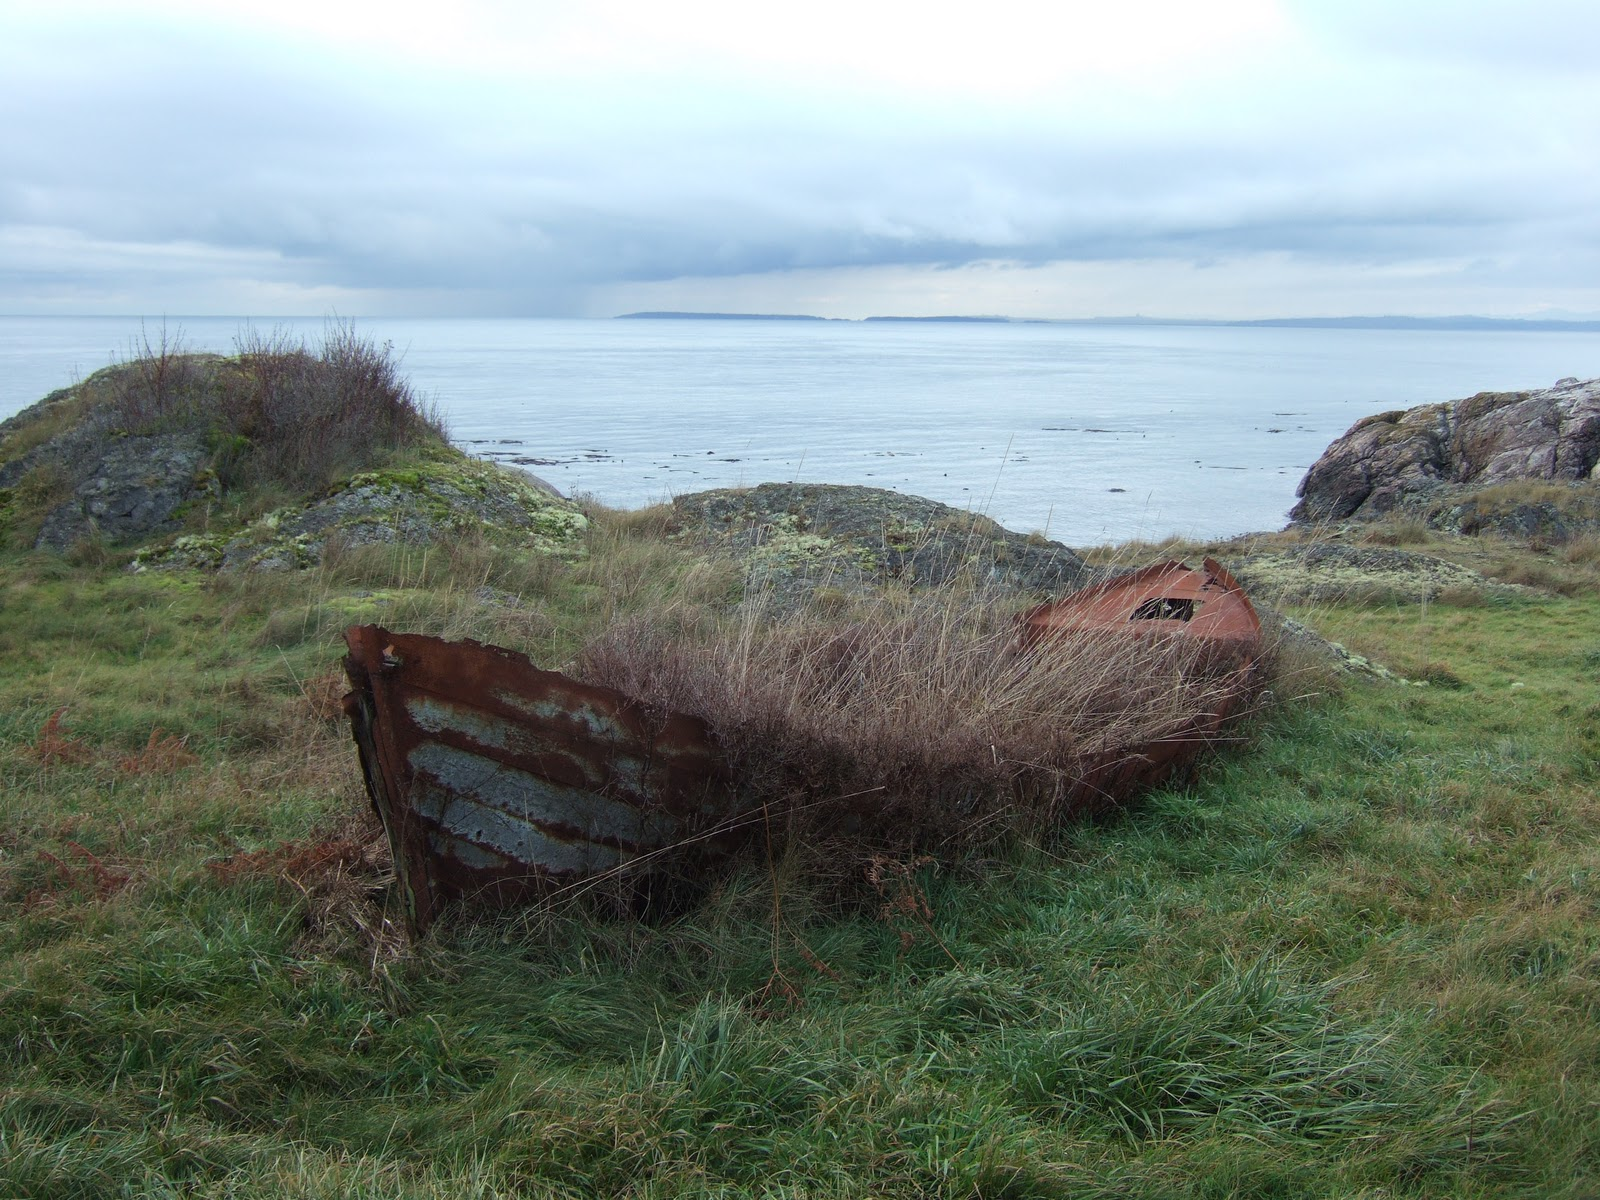 Lieber Haven Resort  Marina: Orcas Island Cottages, Orcas Island